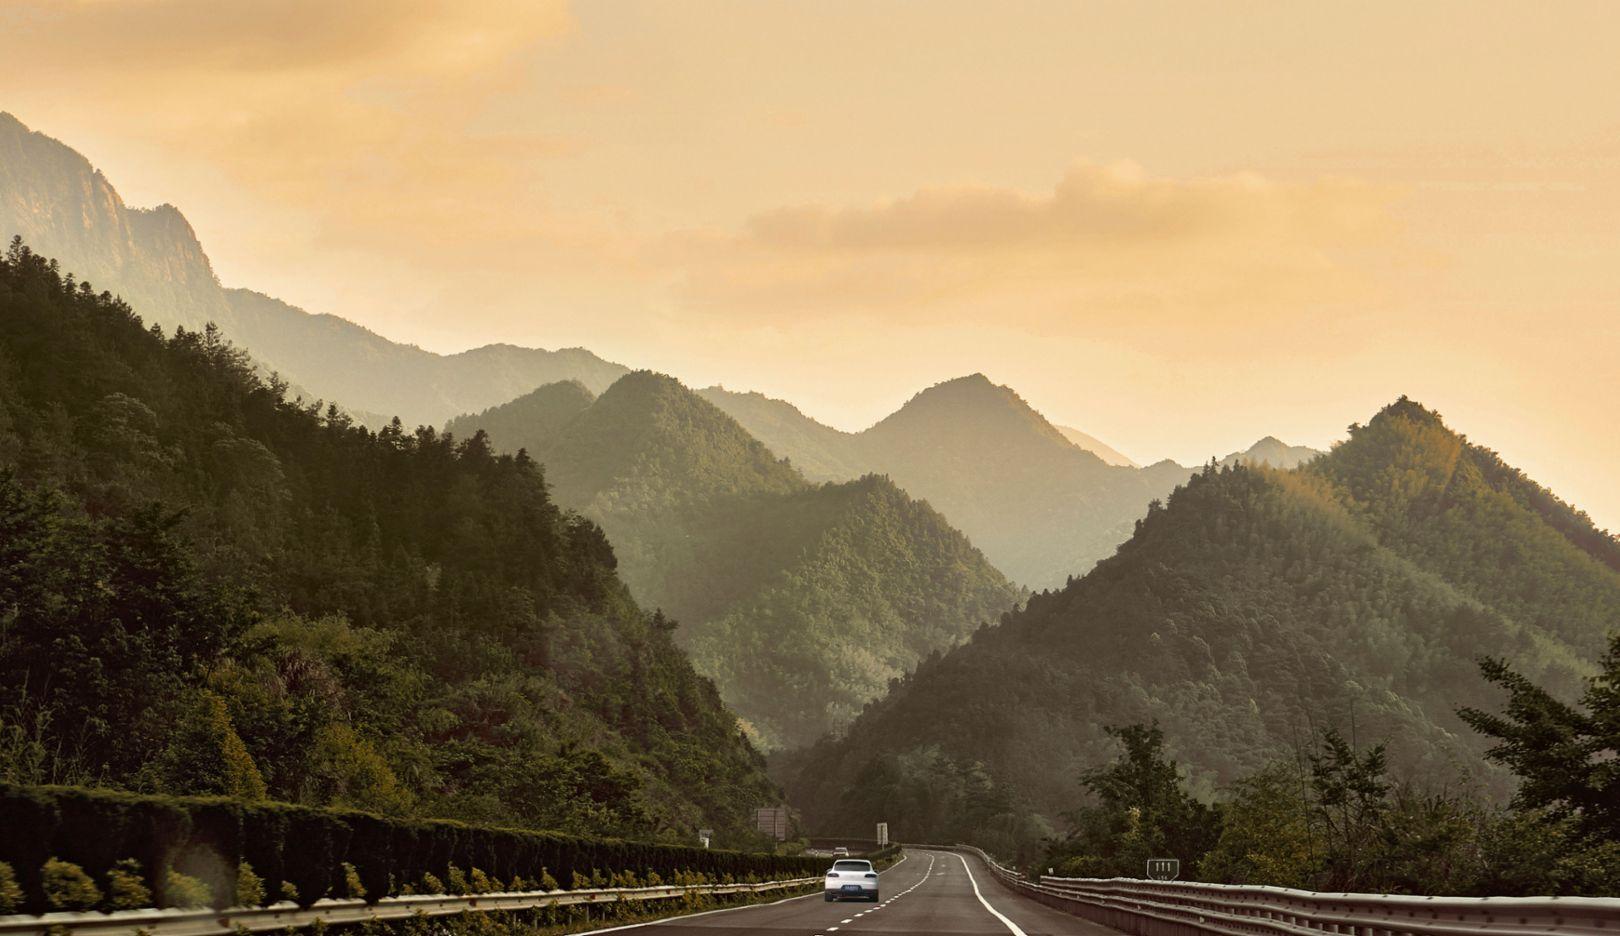 Huangshan-Berge, China, 2017, Porsche AG